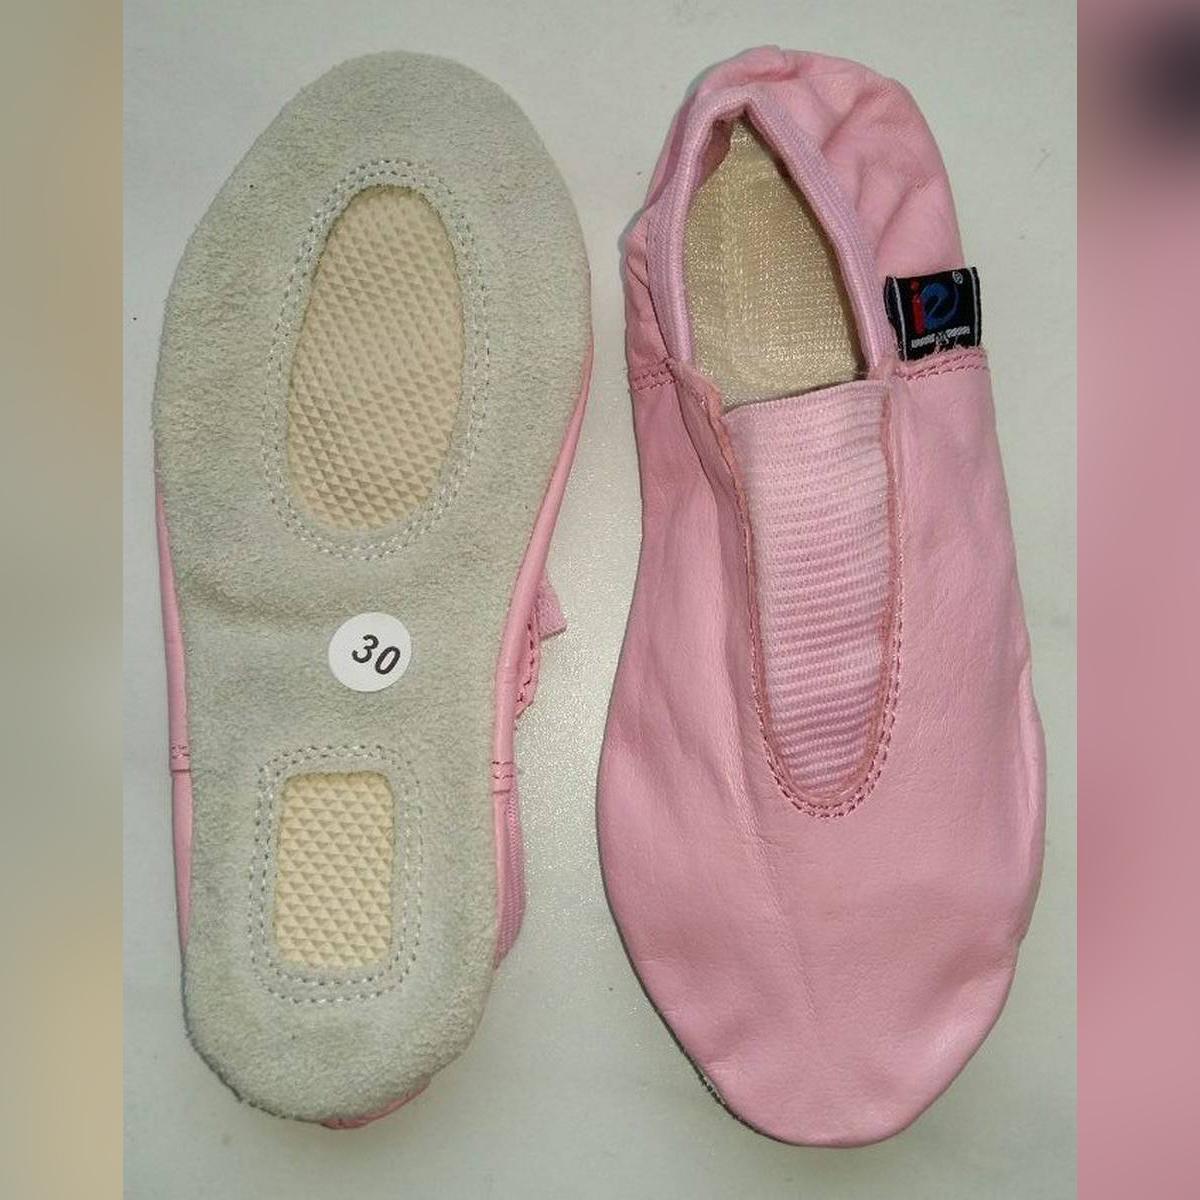 Children Leather Shoes Boot Socks Mozay Comfurtable for Home for unisex